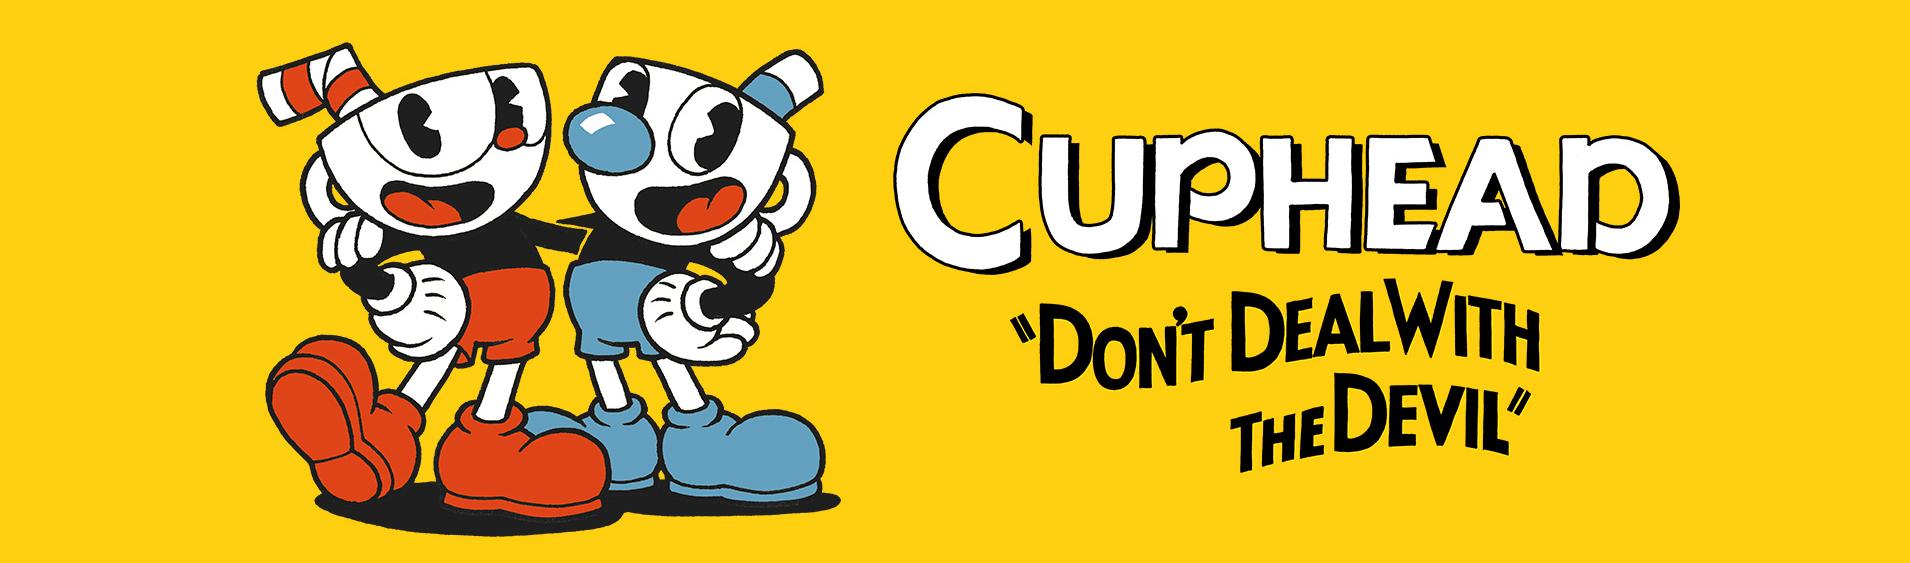 cuphead banner 1